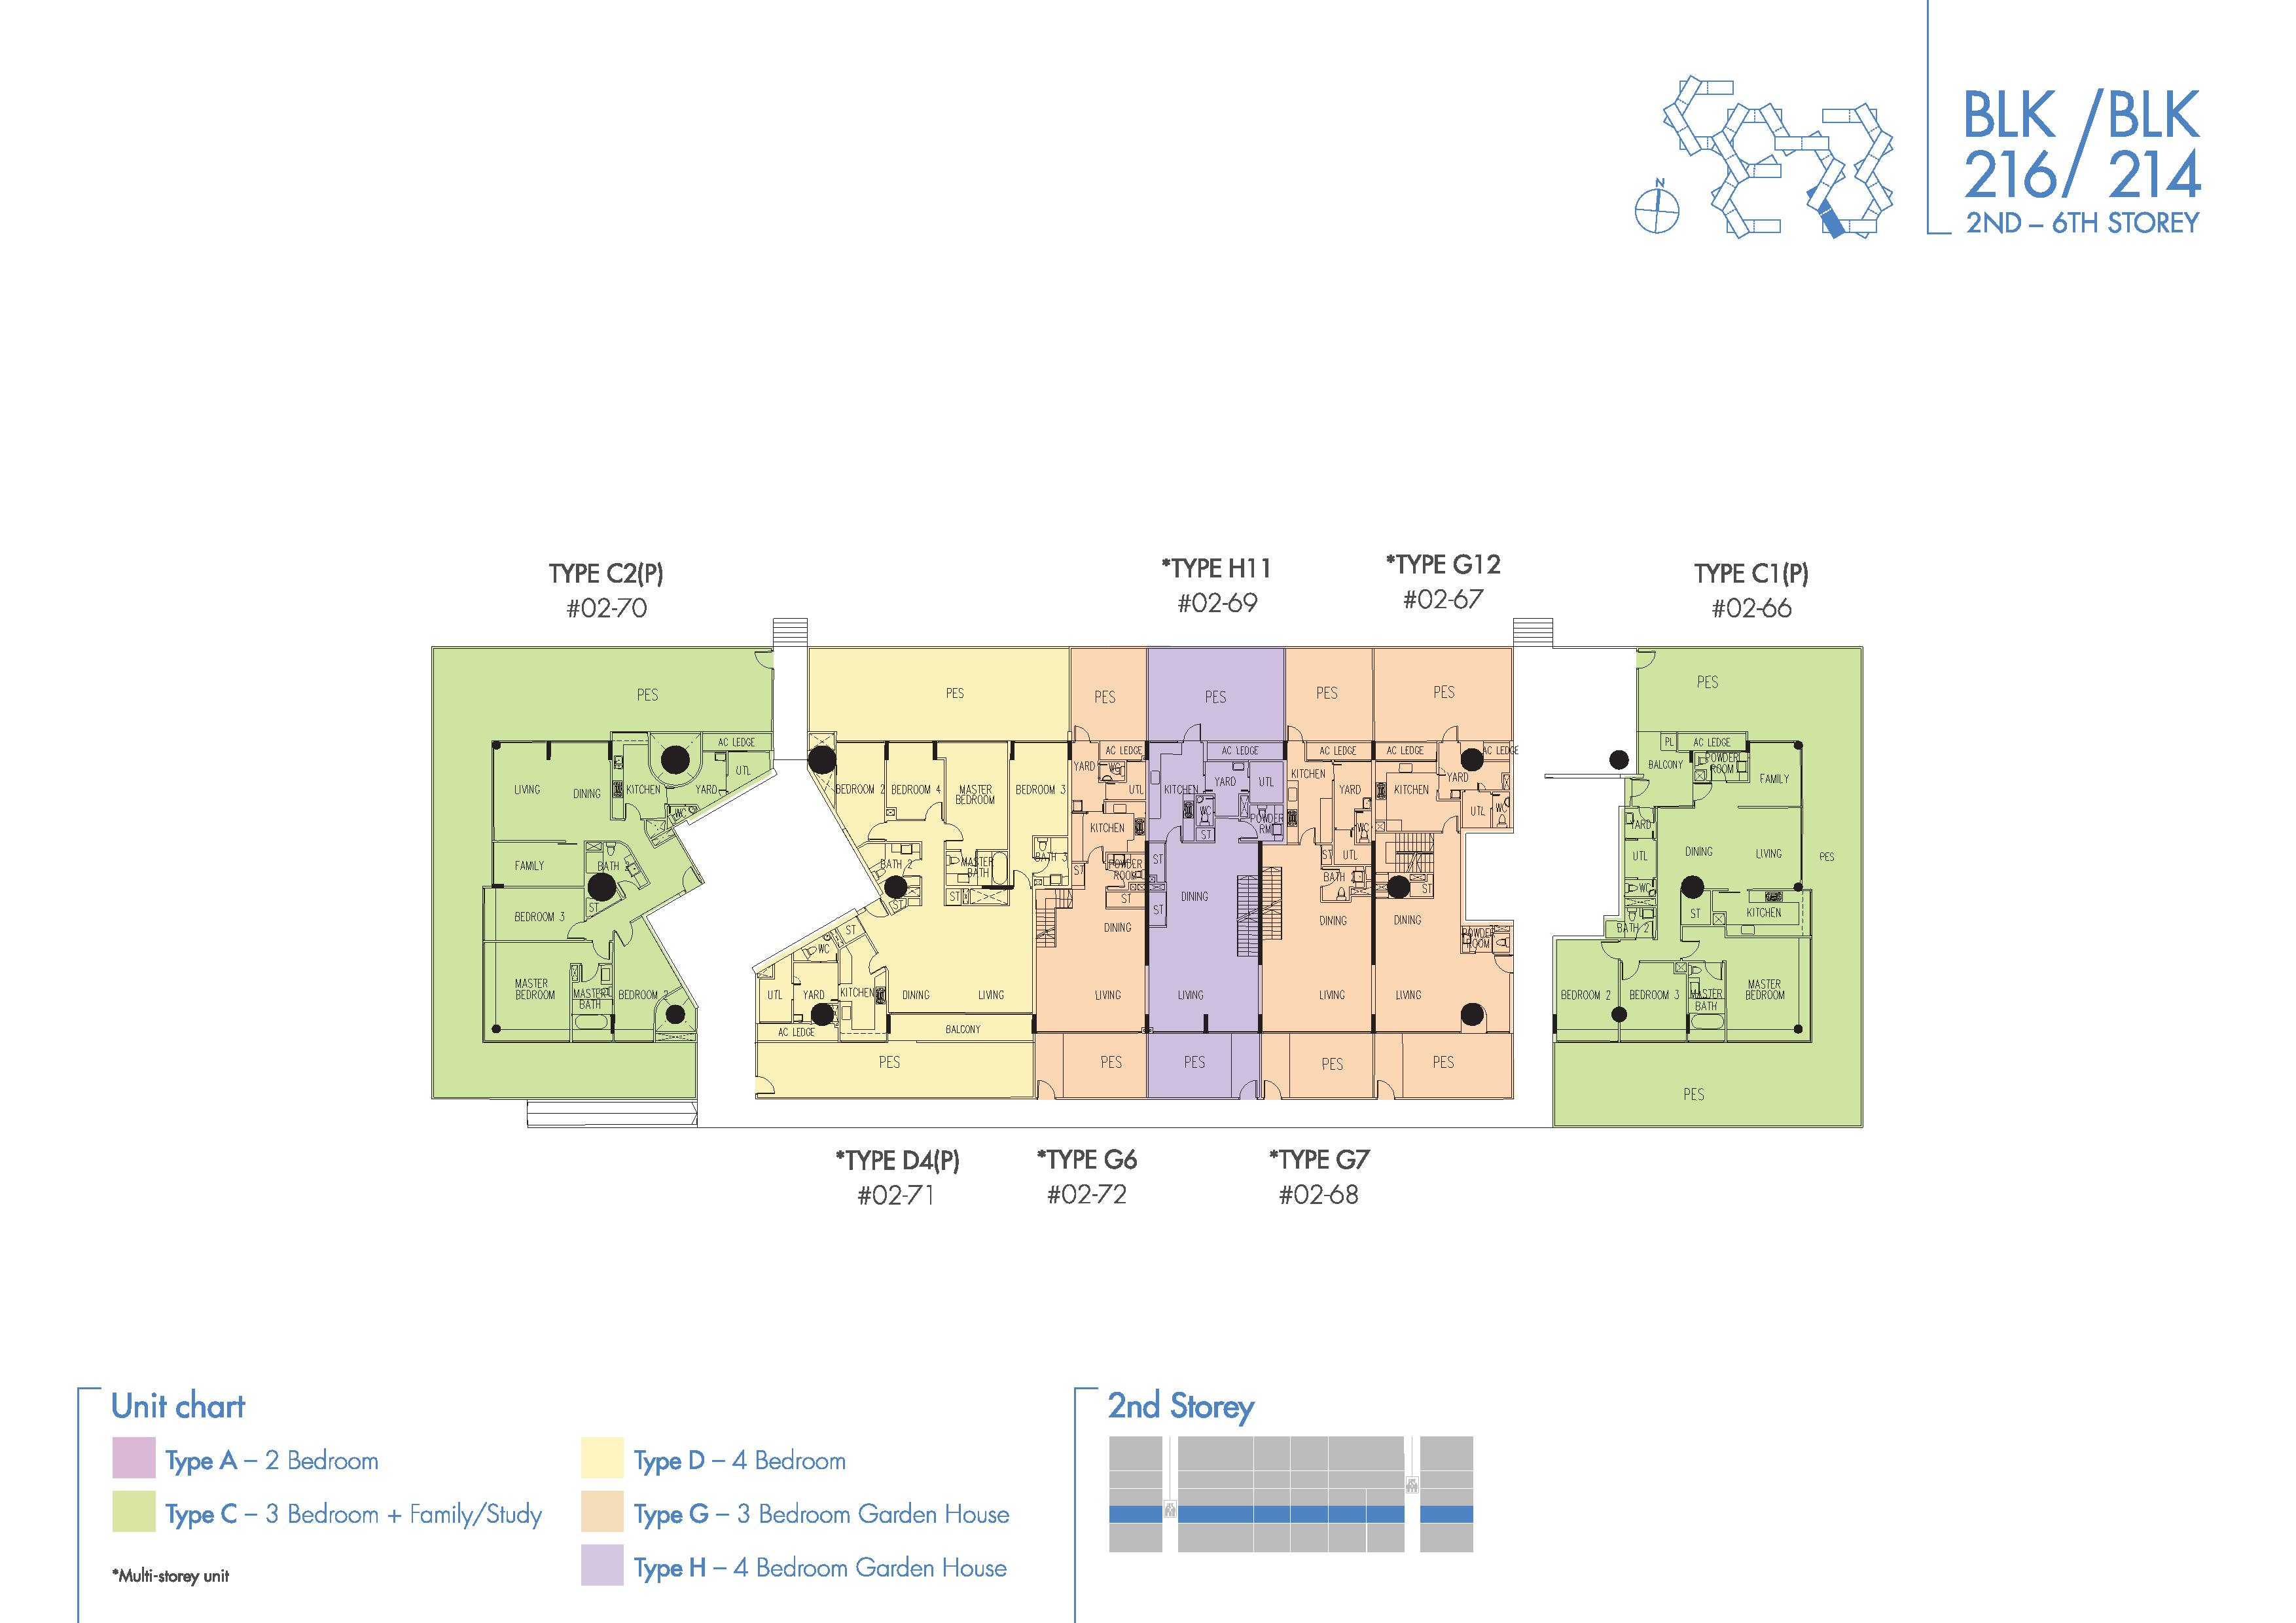 The Interlace Floor Plan